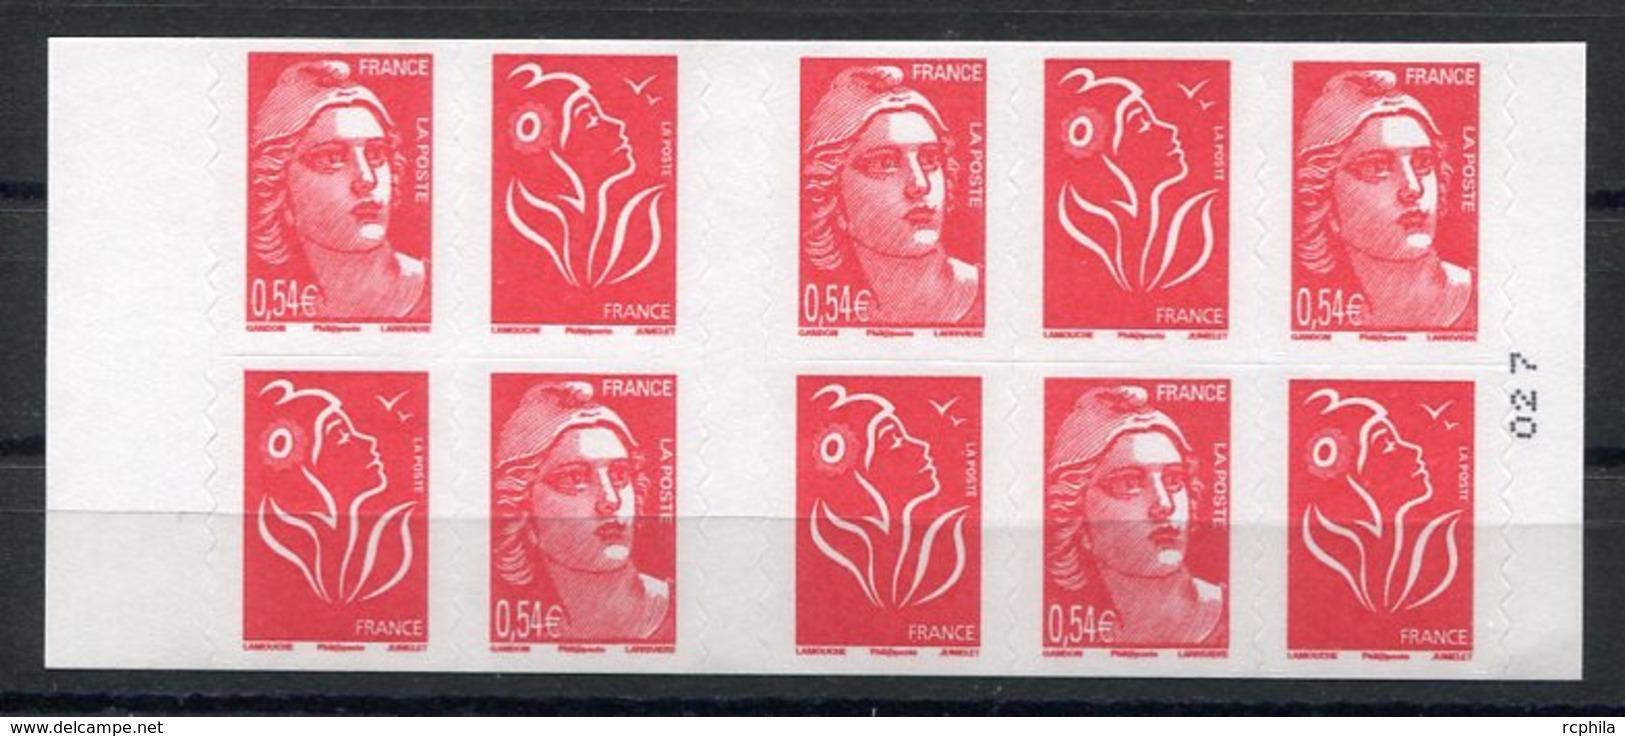 RC 11896 FRANCE CARNET N° 1514 LAMOUCHE + MARIANNE DE GANDON COTE 30€ NEUF ** TB - Freimarke